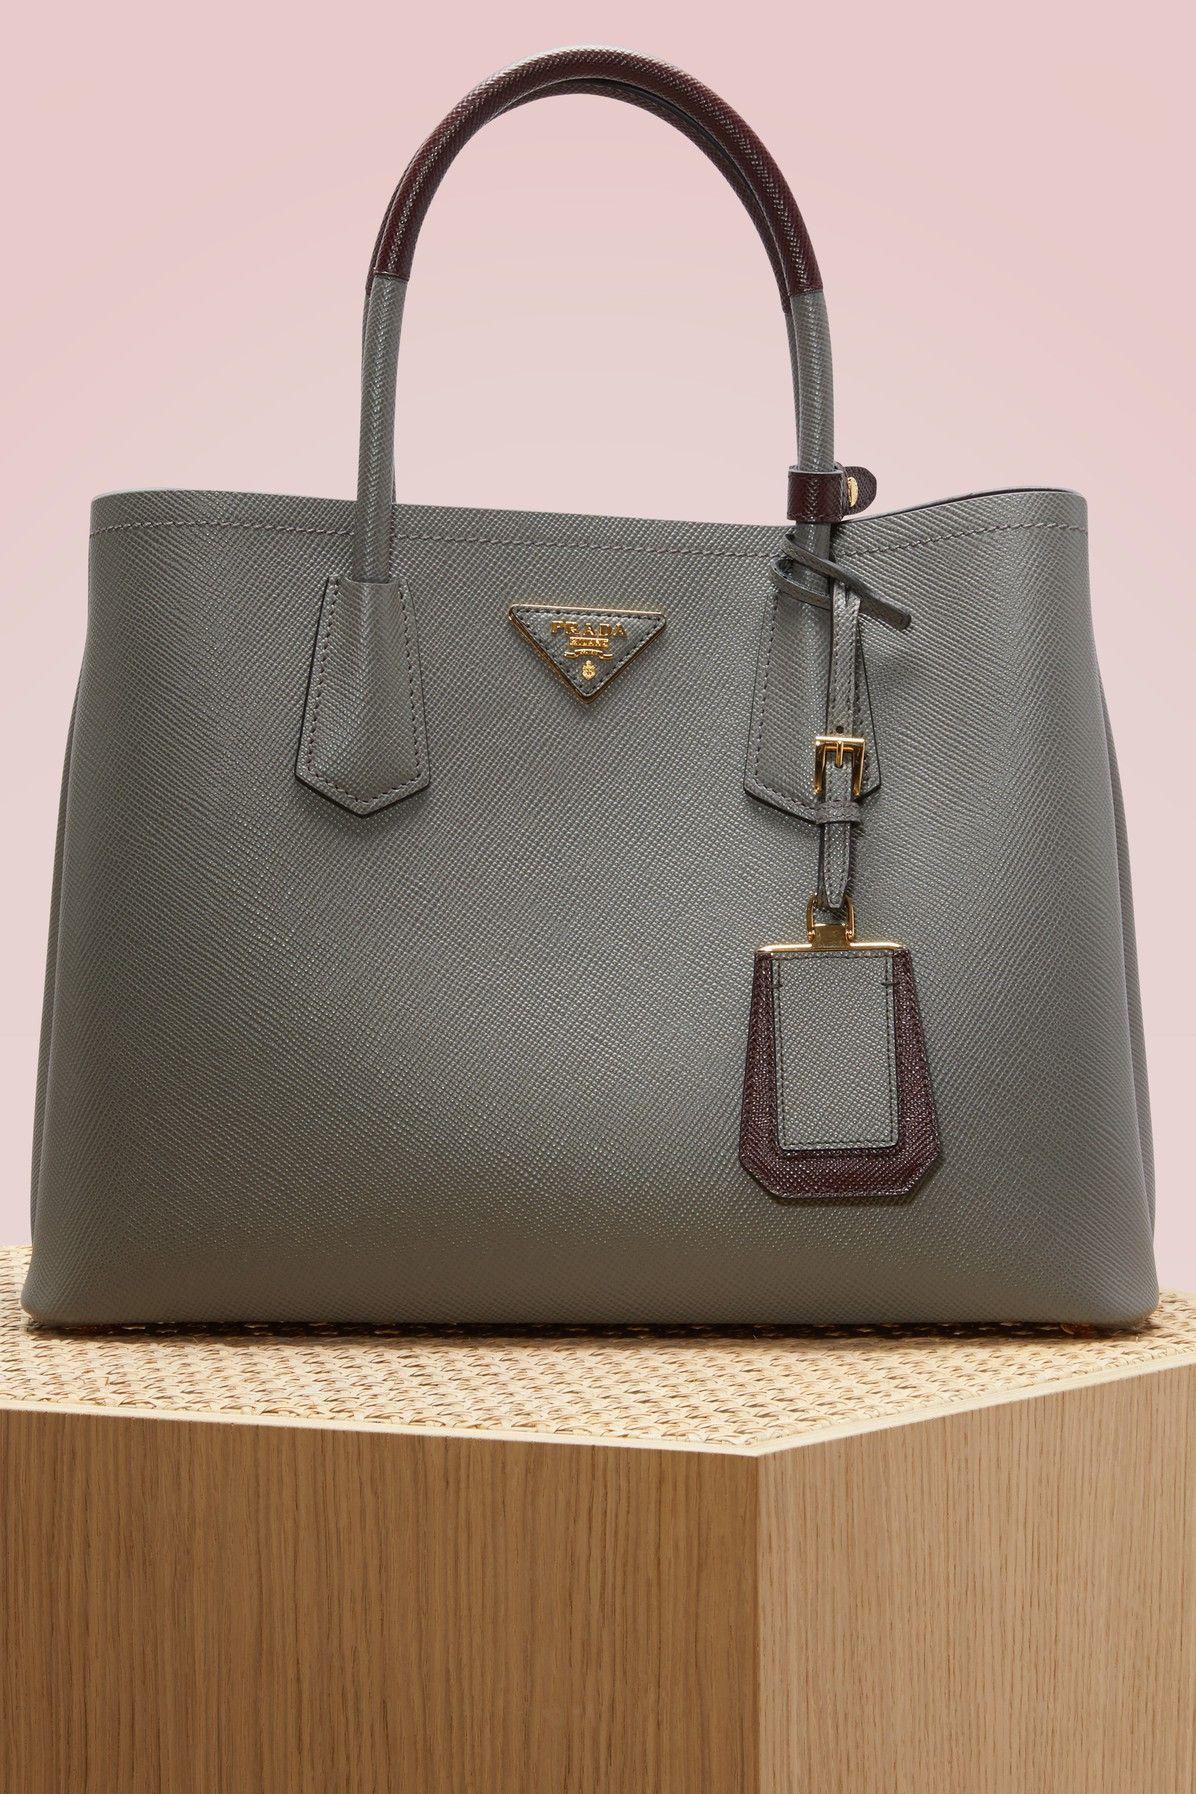 Prada Bicolore Handbag Bags Shoulder Hand Leather Pouch Accessories